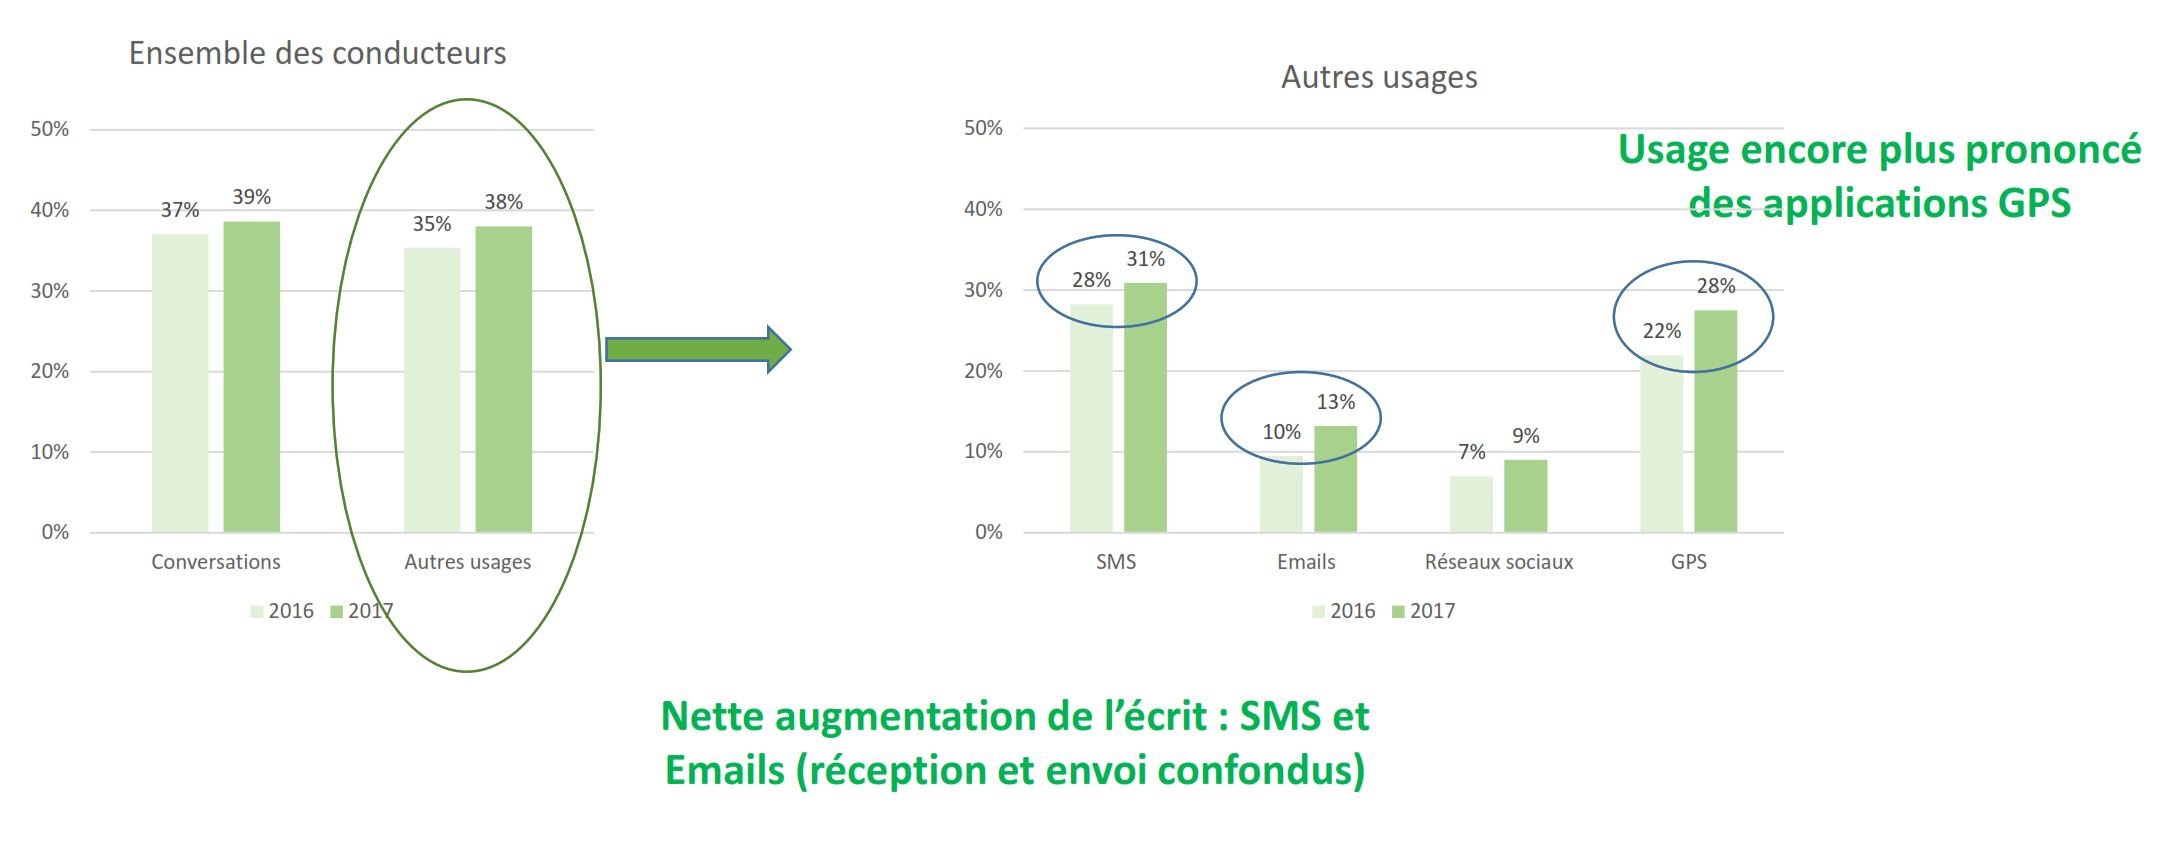 barometre 2017 telephone au volant isttar maif types usages